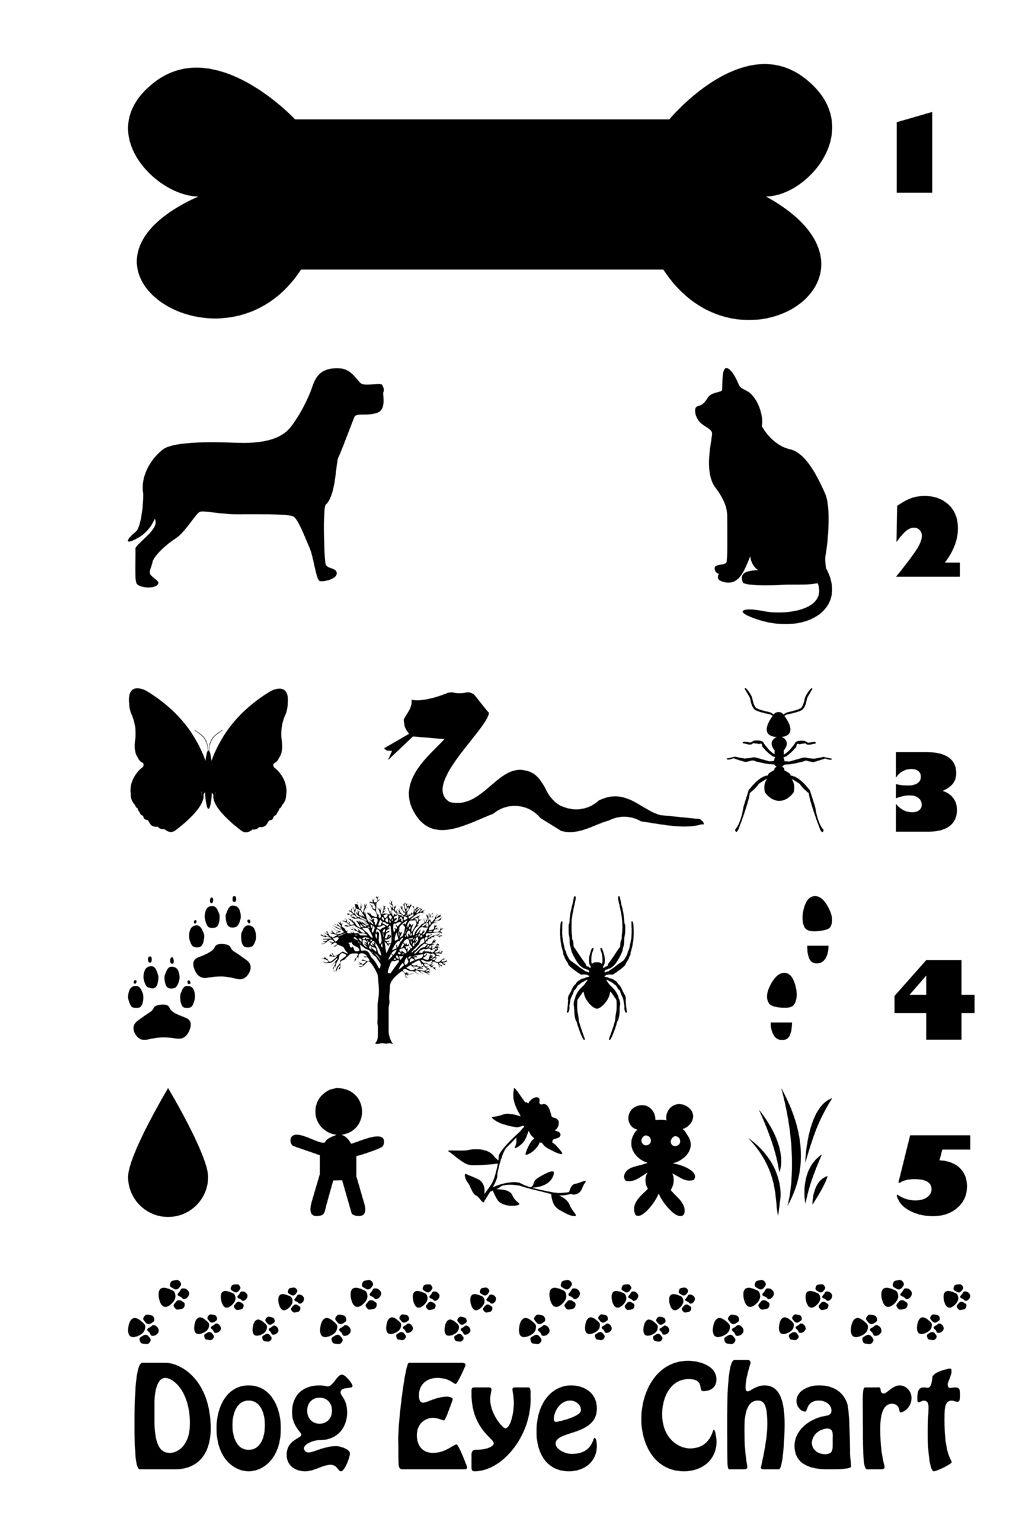 Dog eye chart graphic design pinterest chart dog and doggies shop dog eye chart postcard created by estjohn nvjuhfo Gallery